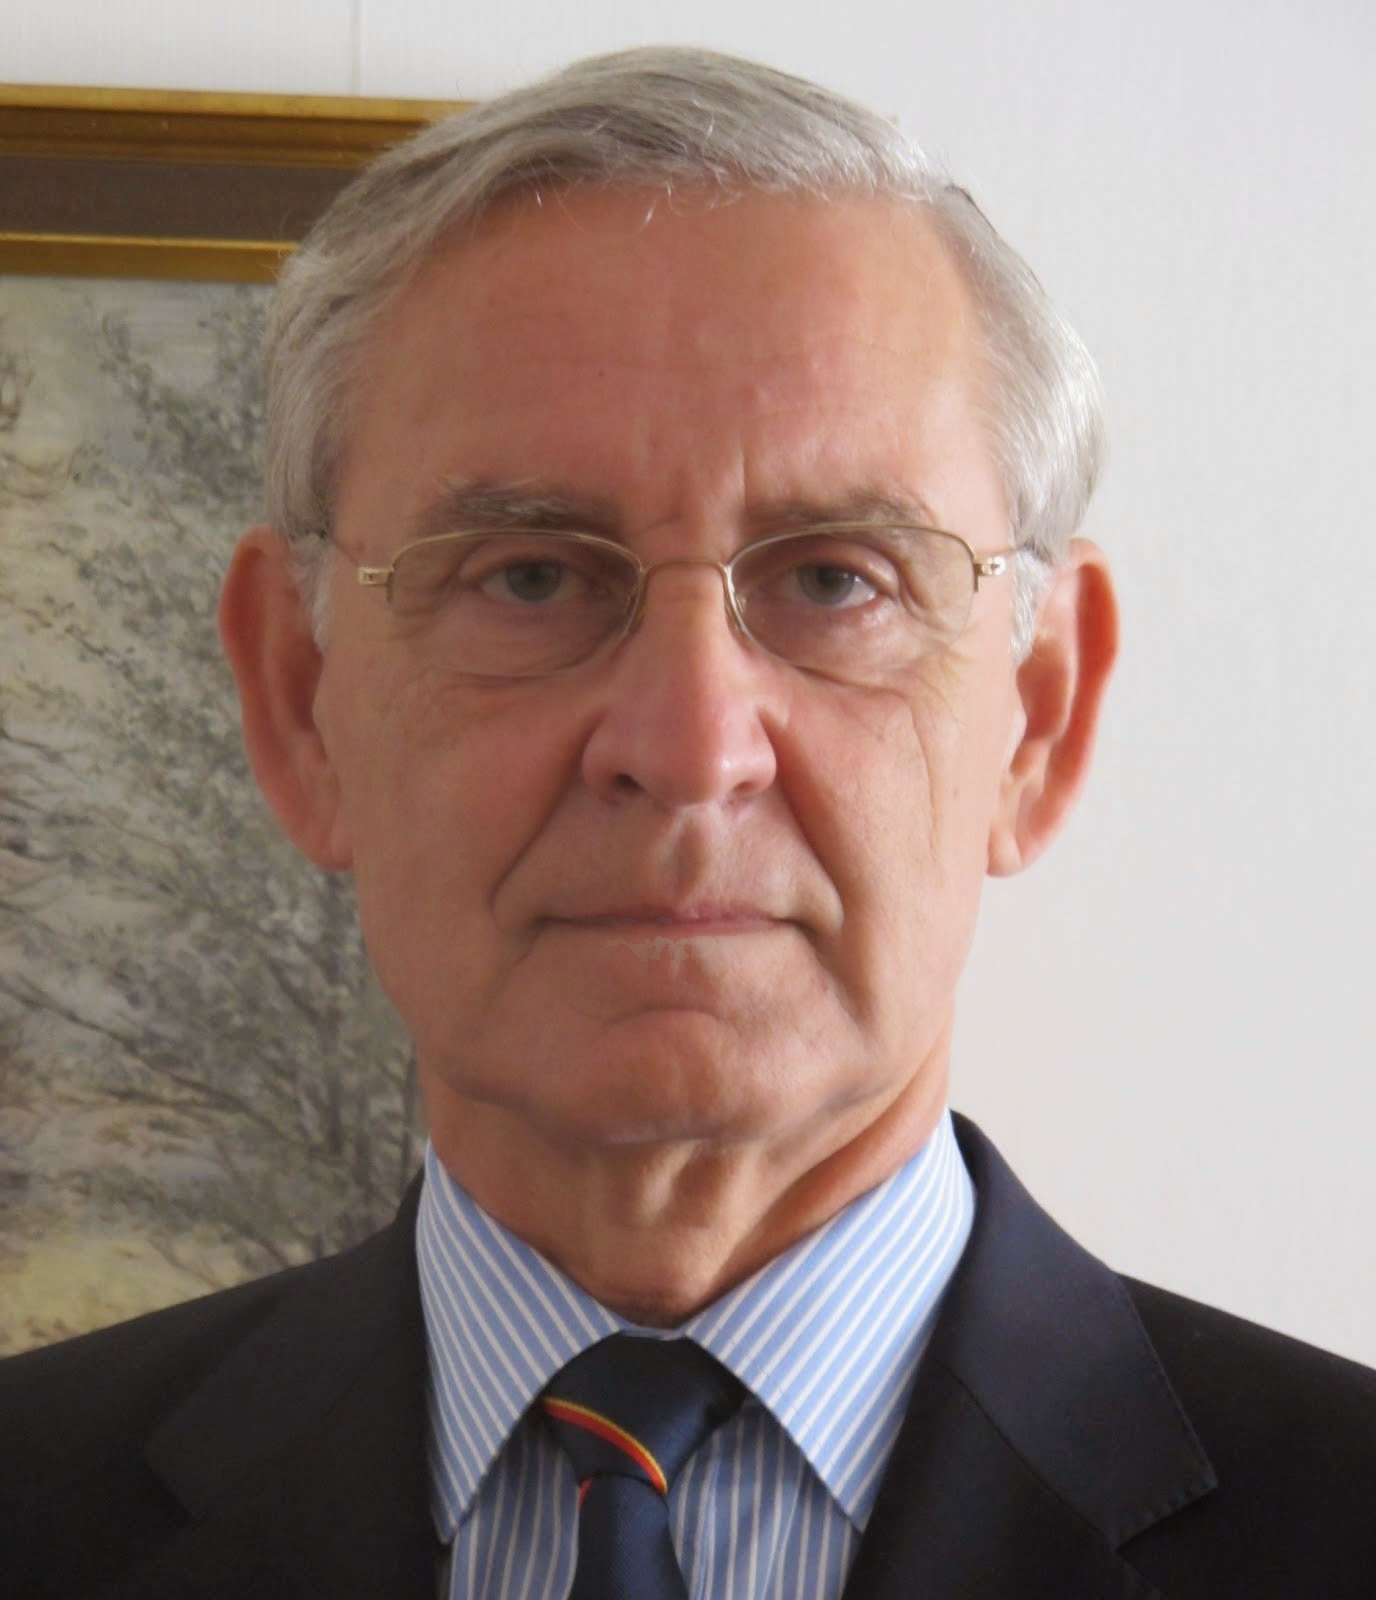 Karlis Neretnieks